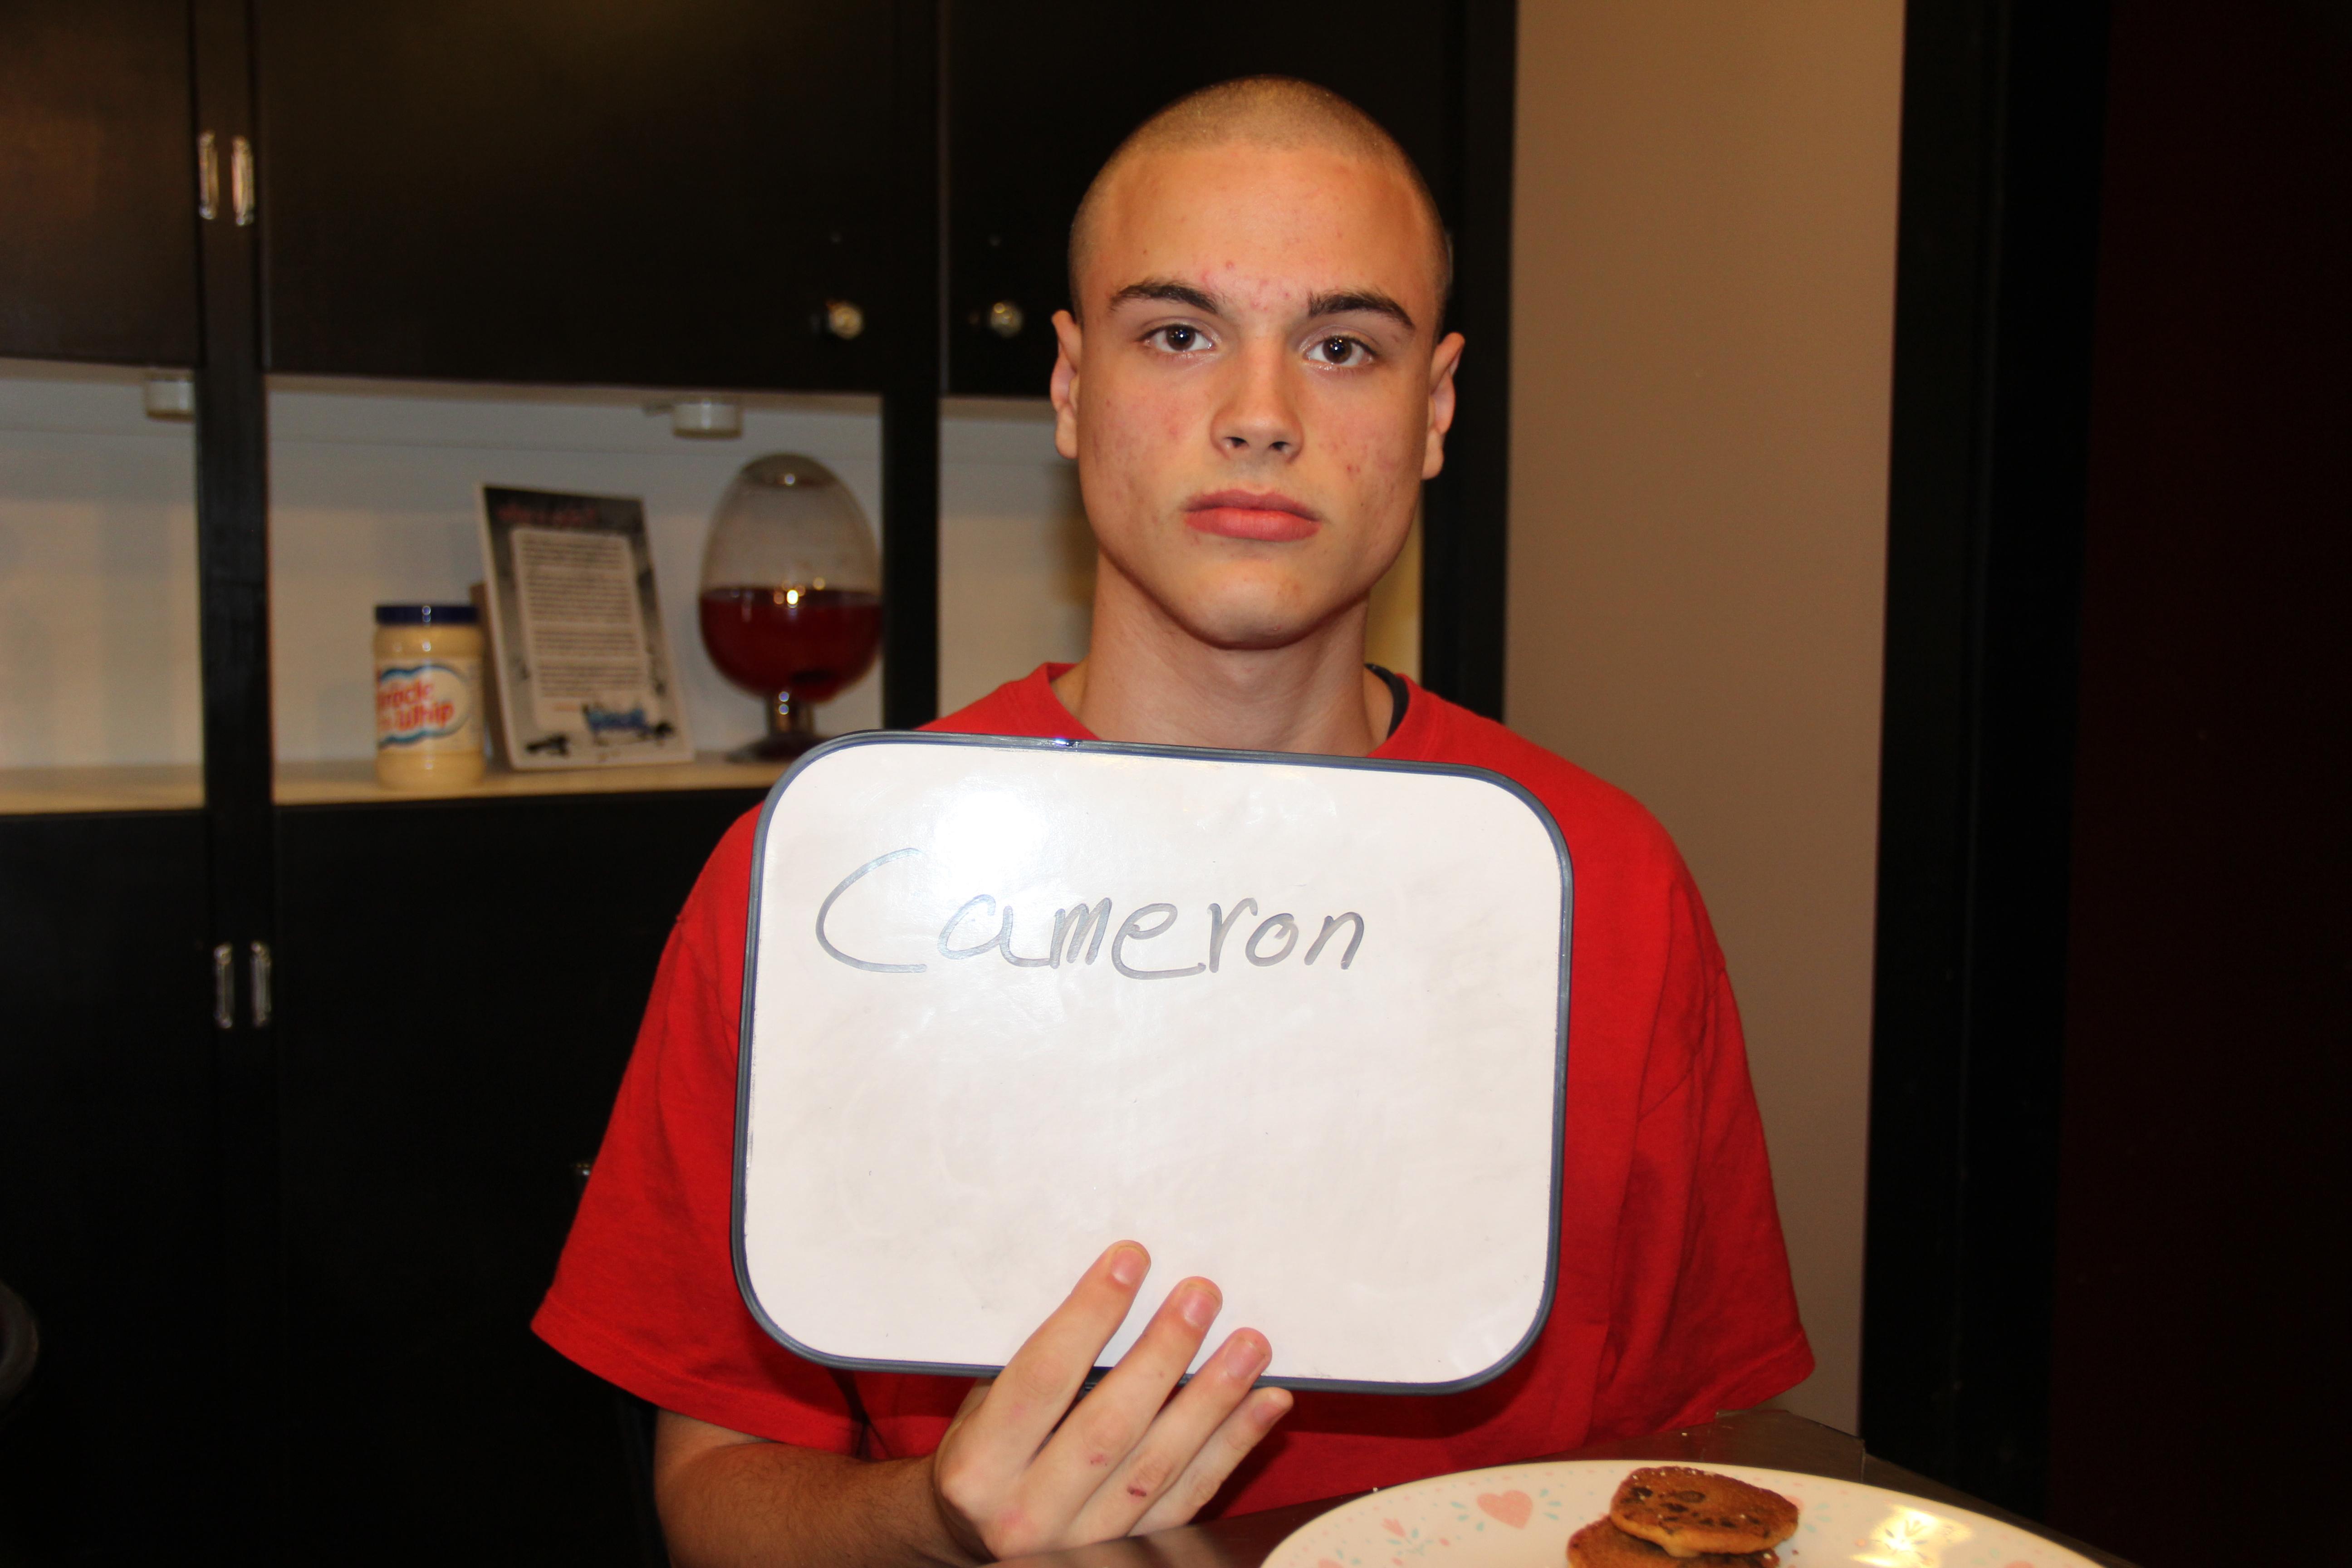 Cameron-001.JPG